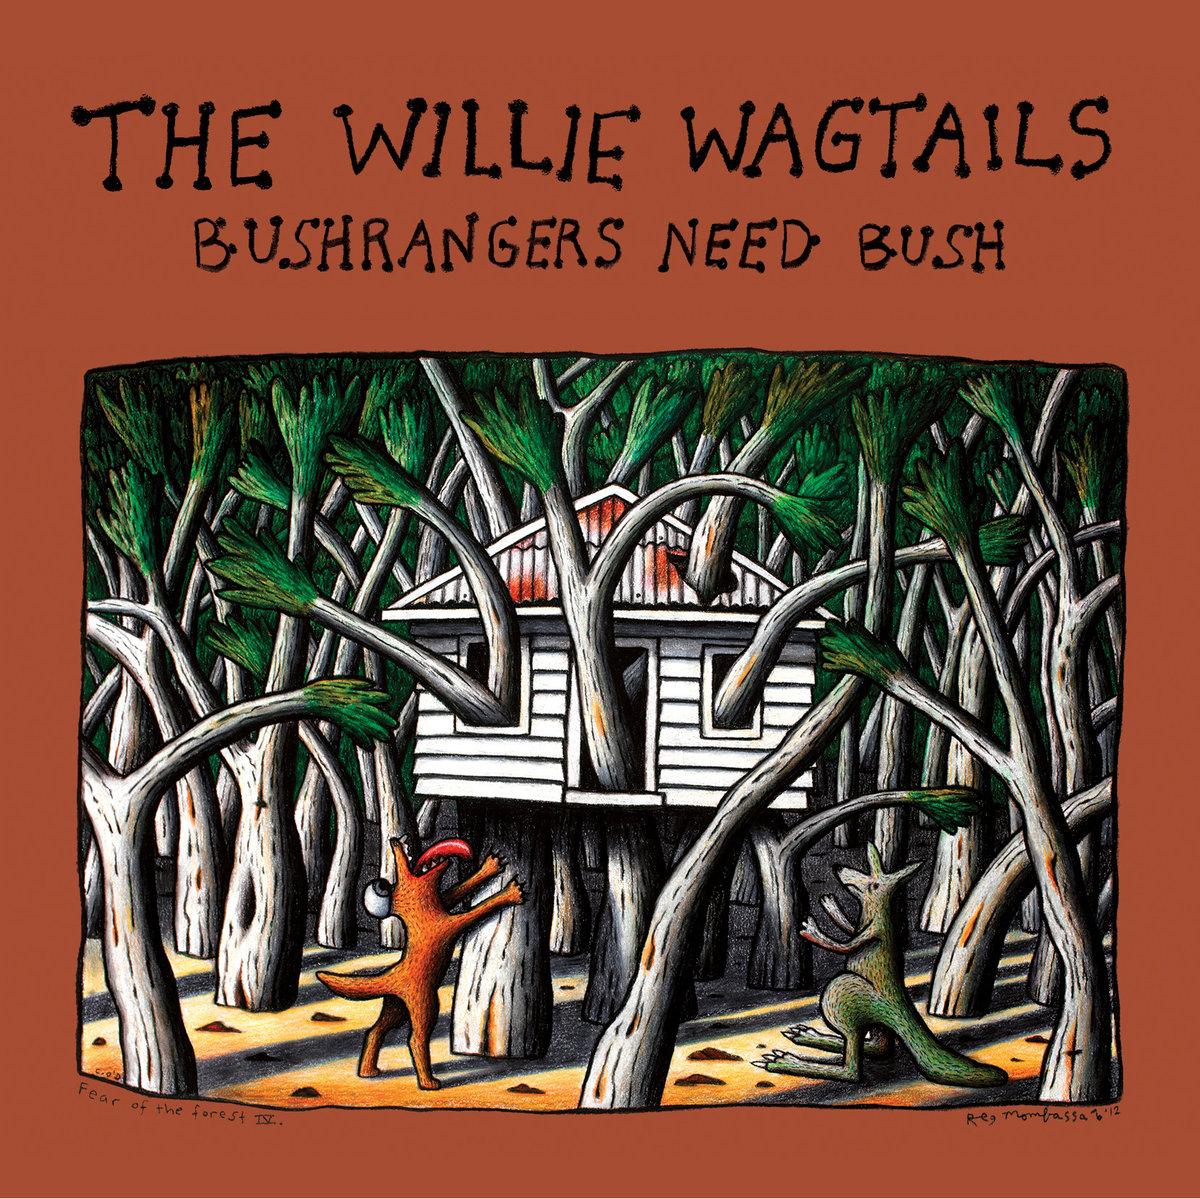 The Willie Wagtails - Bushrangers Need Bush